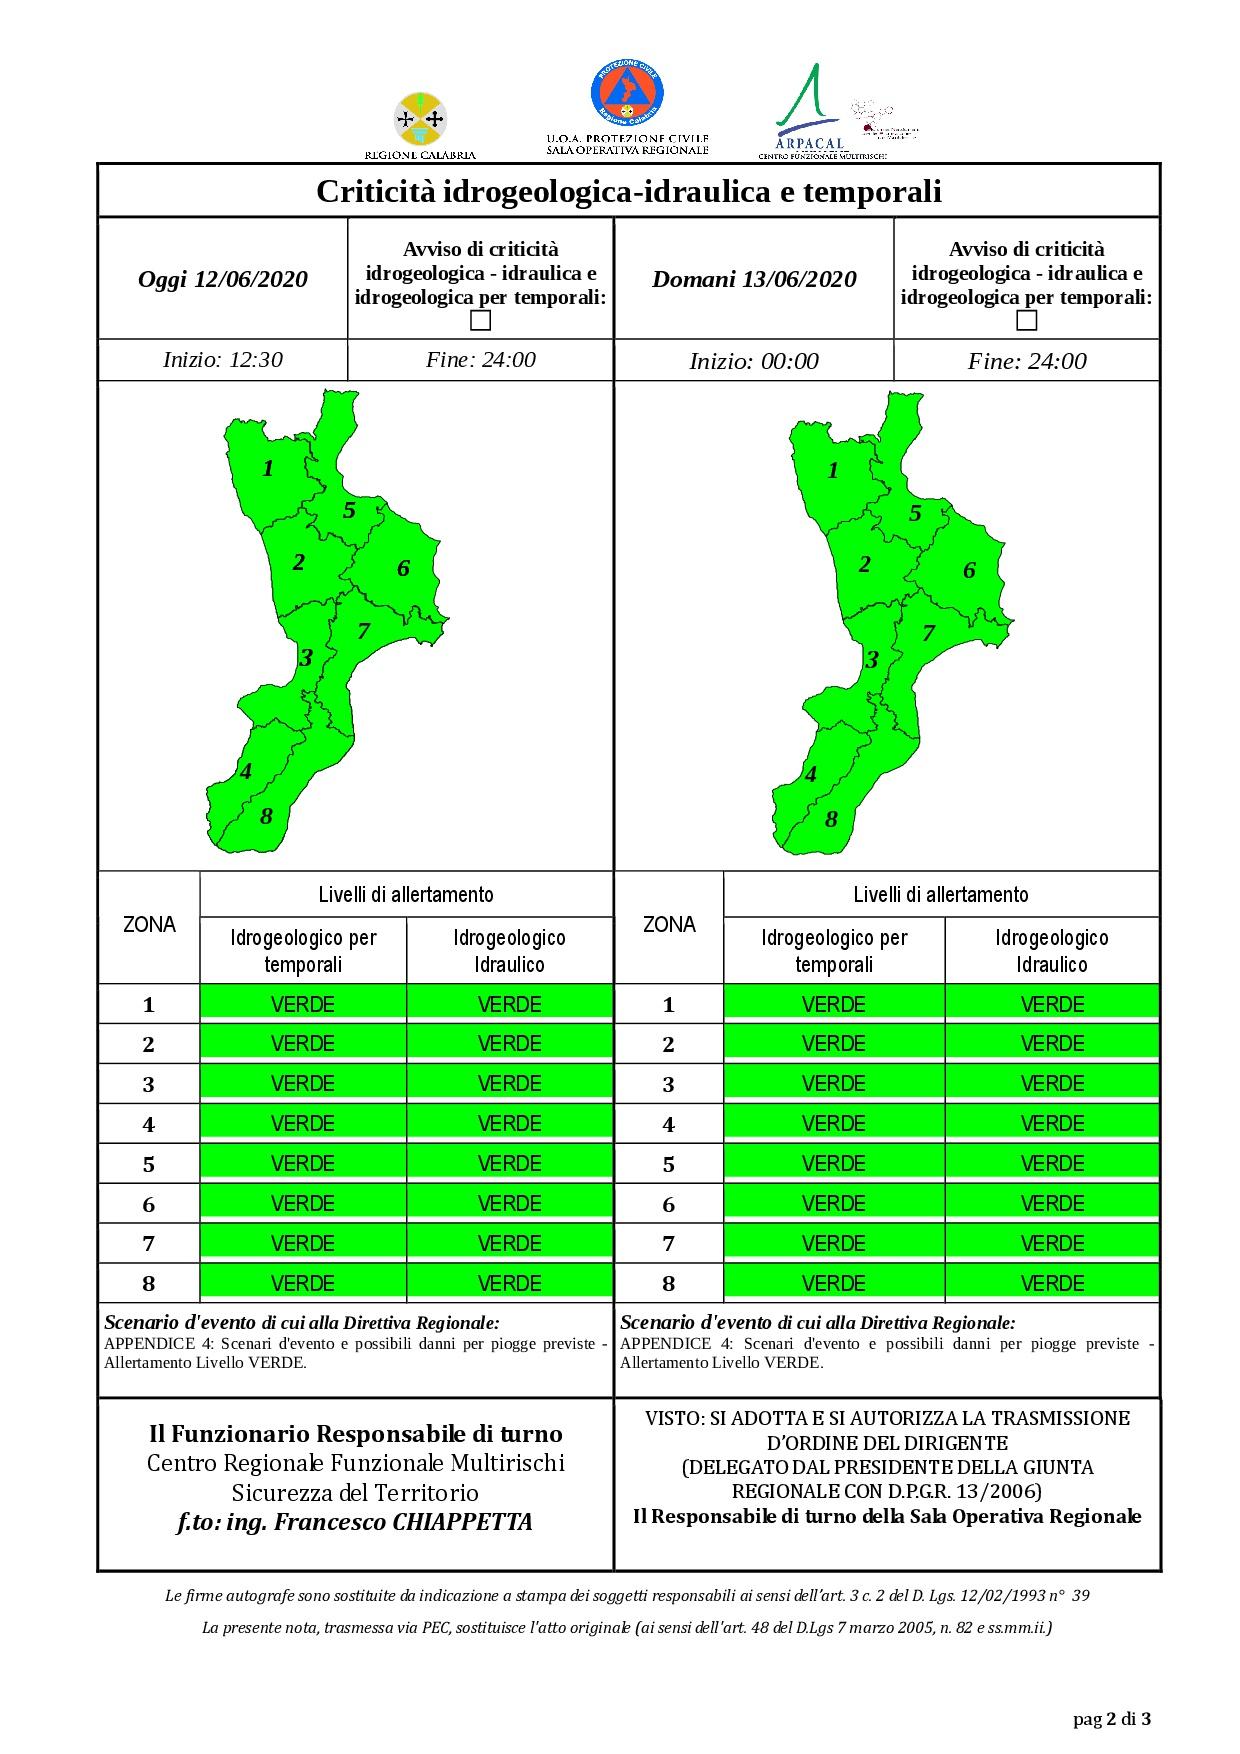 Criticità idrogeologica-idraulica e temporali in Calabria 12-06-2020